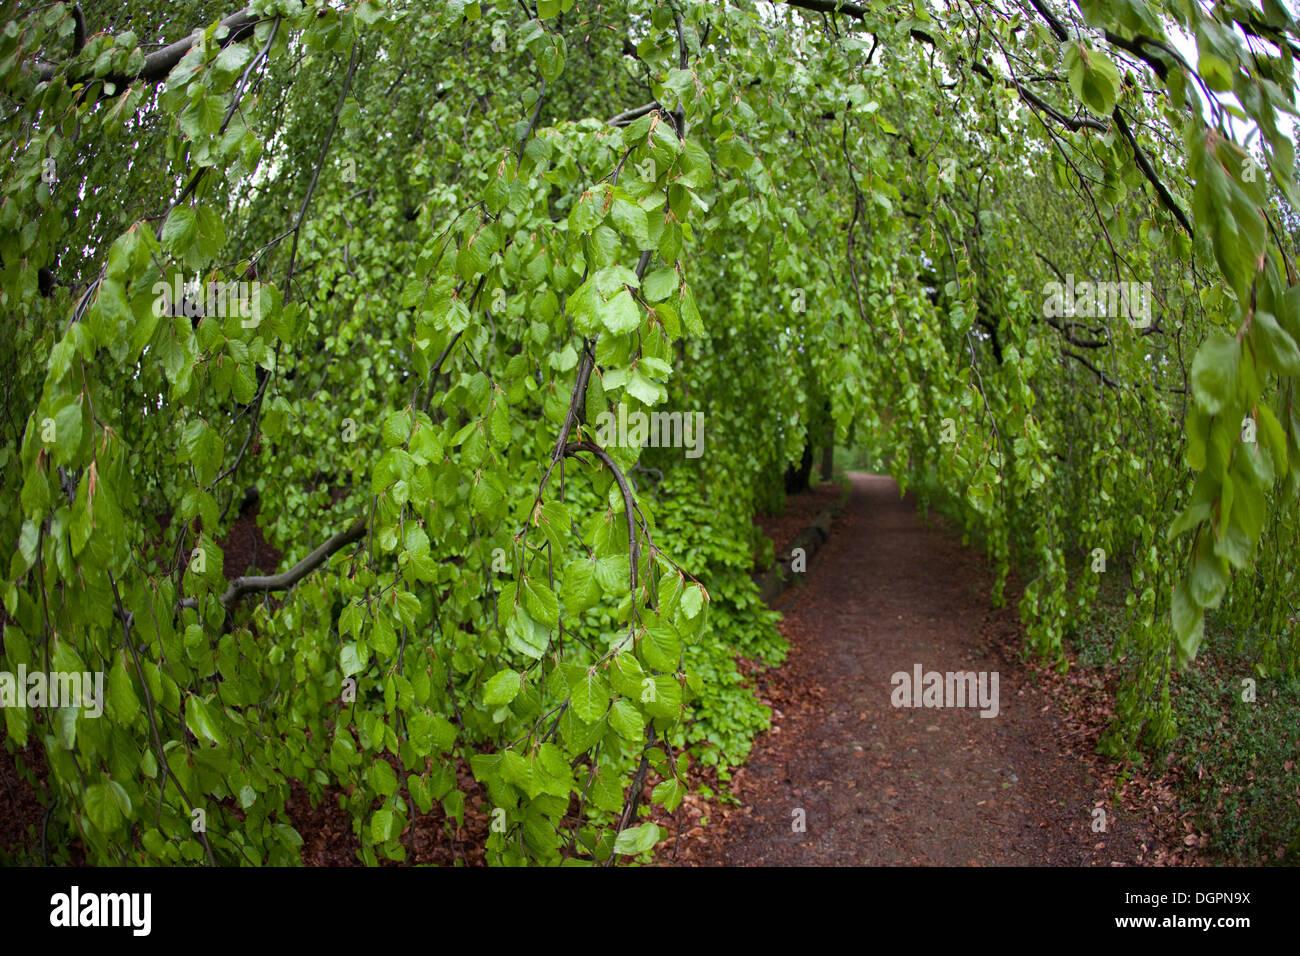 large beech tree stockfotos large beech tree bilder alamy. Black Bedroom Furniture Sets. Home Design Ideas